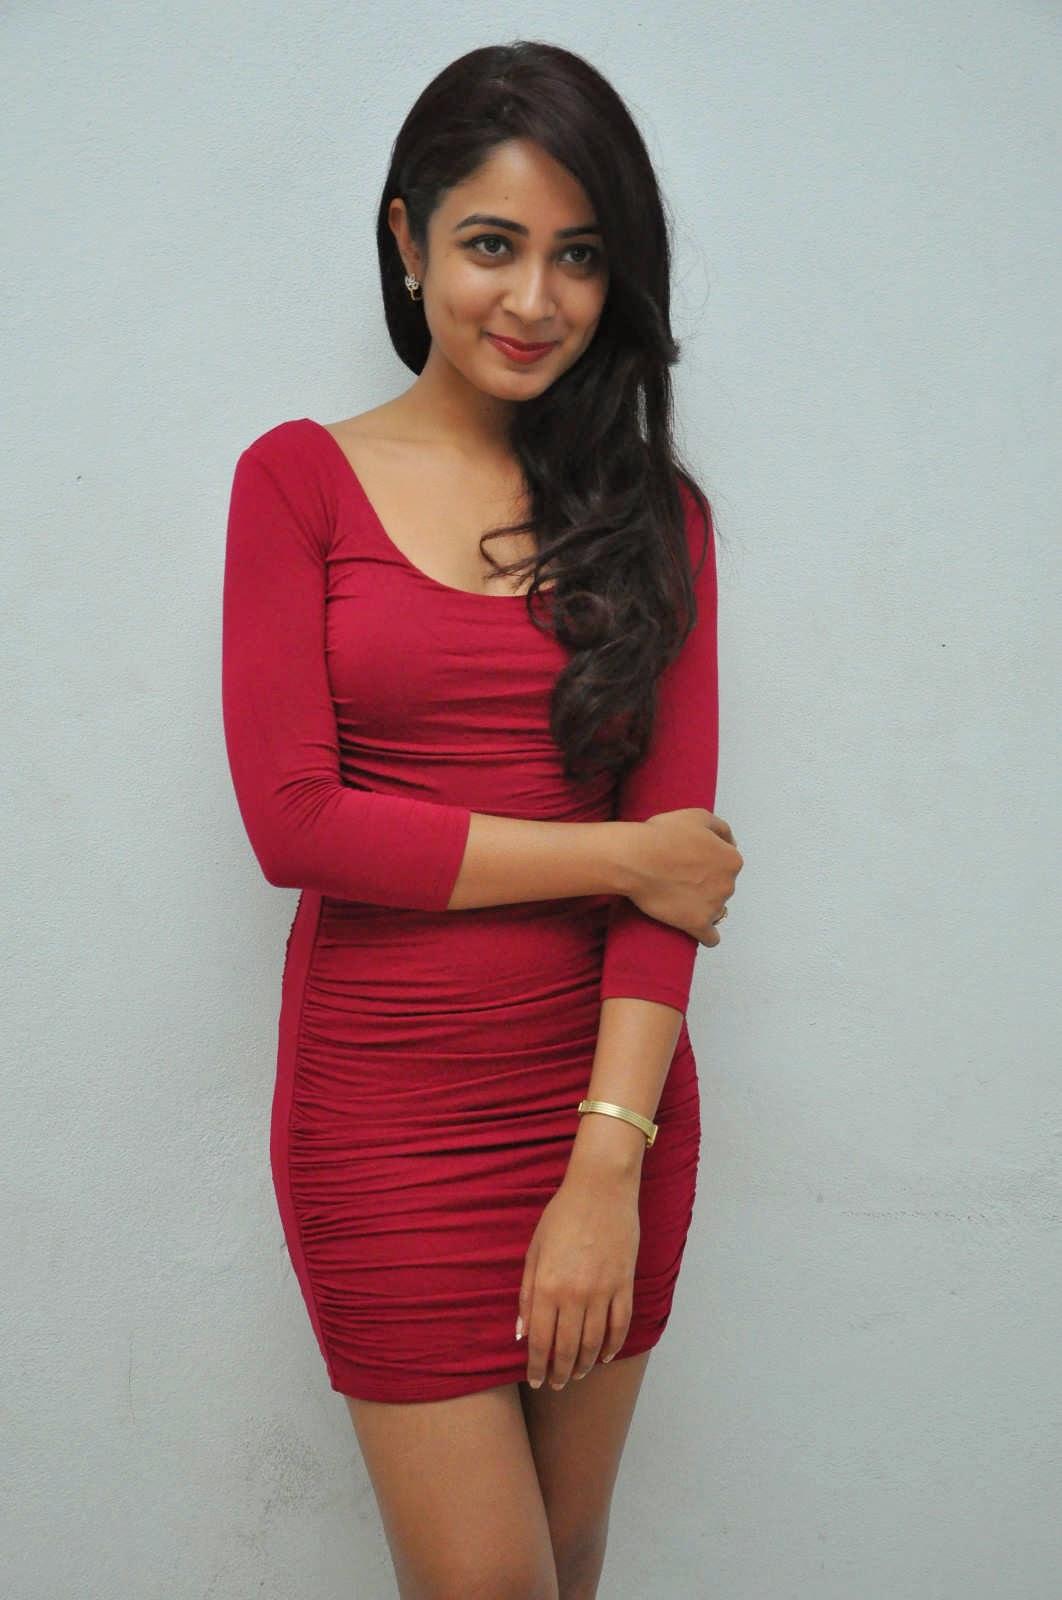 Actress Aditi Chengappa Latest Cute Hot Red Mini Skirt Dress Spicy Thighs Show Photos Gallery At Moodu Mukkallo Cheppalante Audio Launch